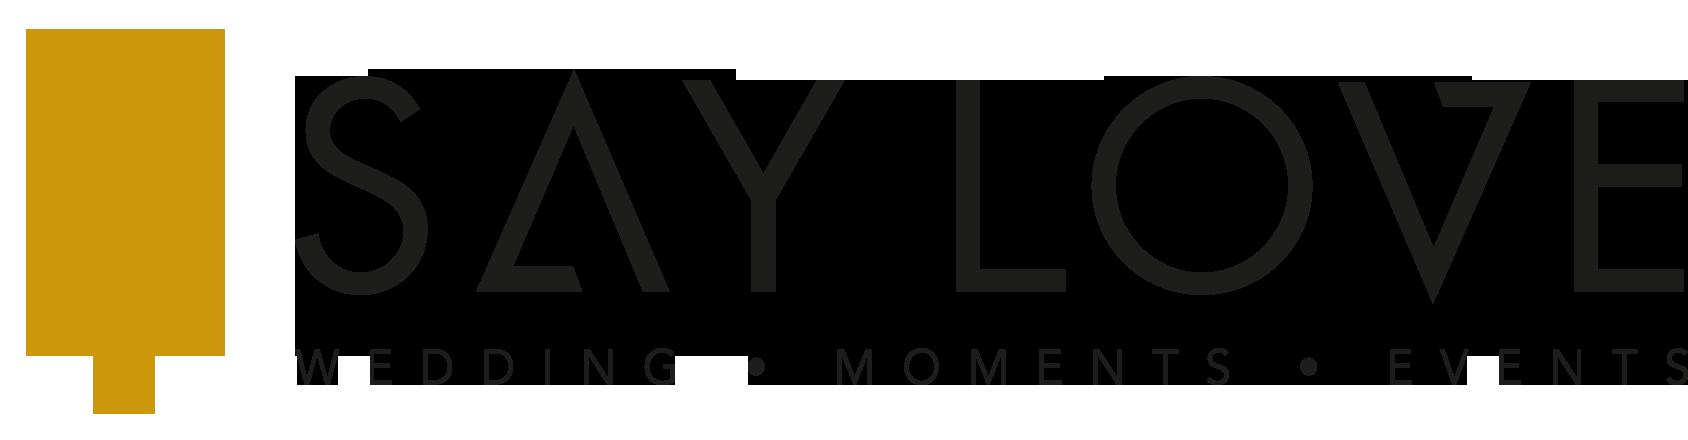 Saylove - Wedding, moments, events.